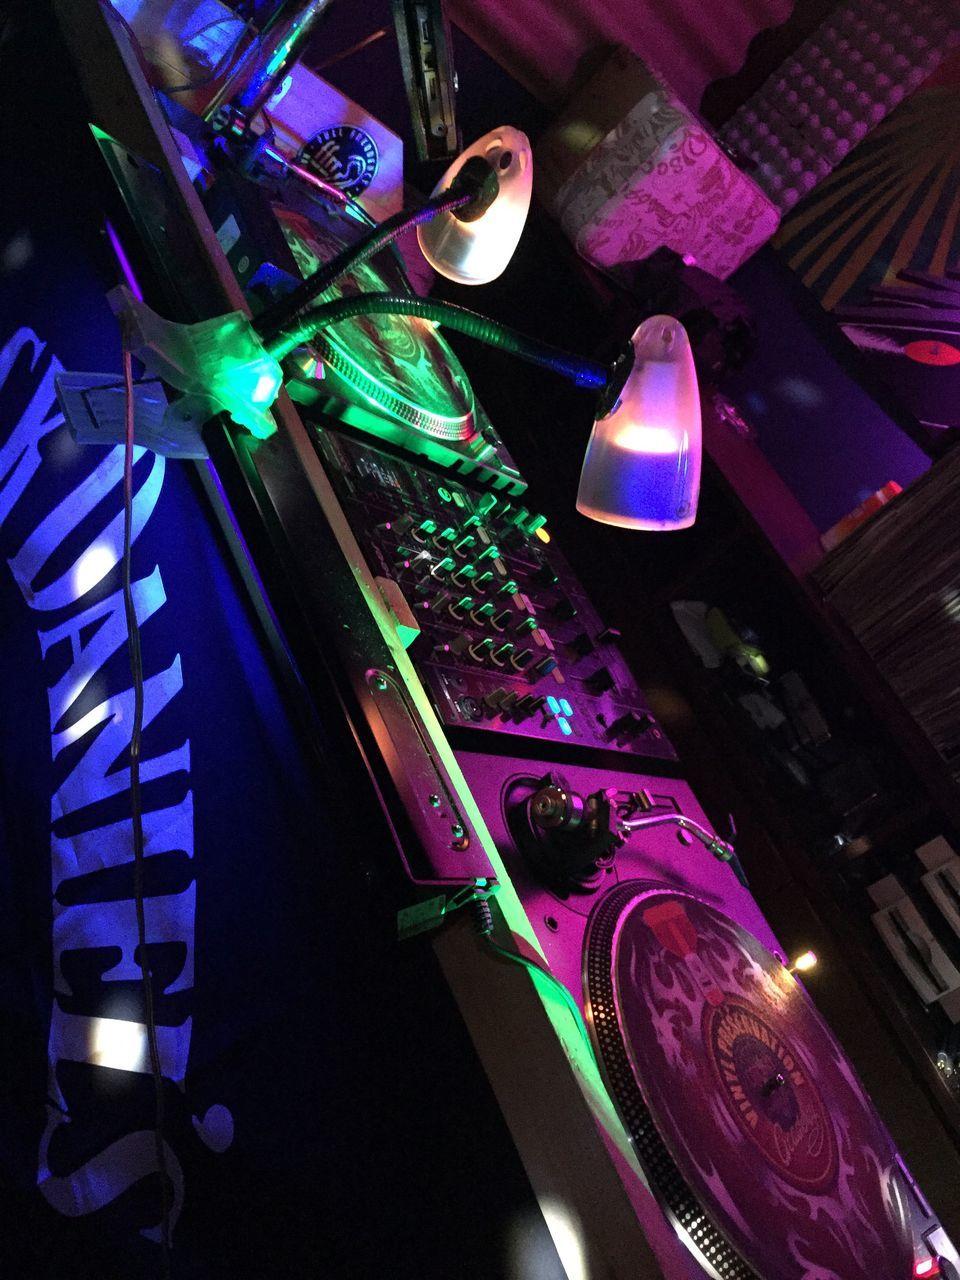 illuminated, lighting equipment, indoors, no people, technology, music, multi colored, night, nightclub, musical instrument, close-up